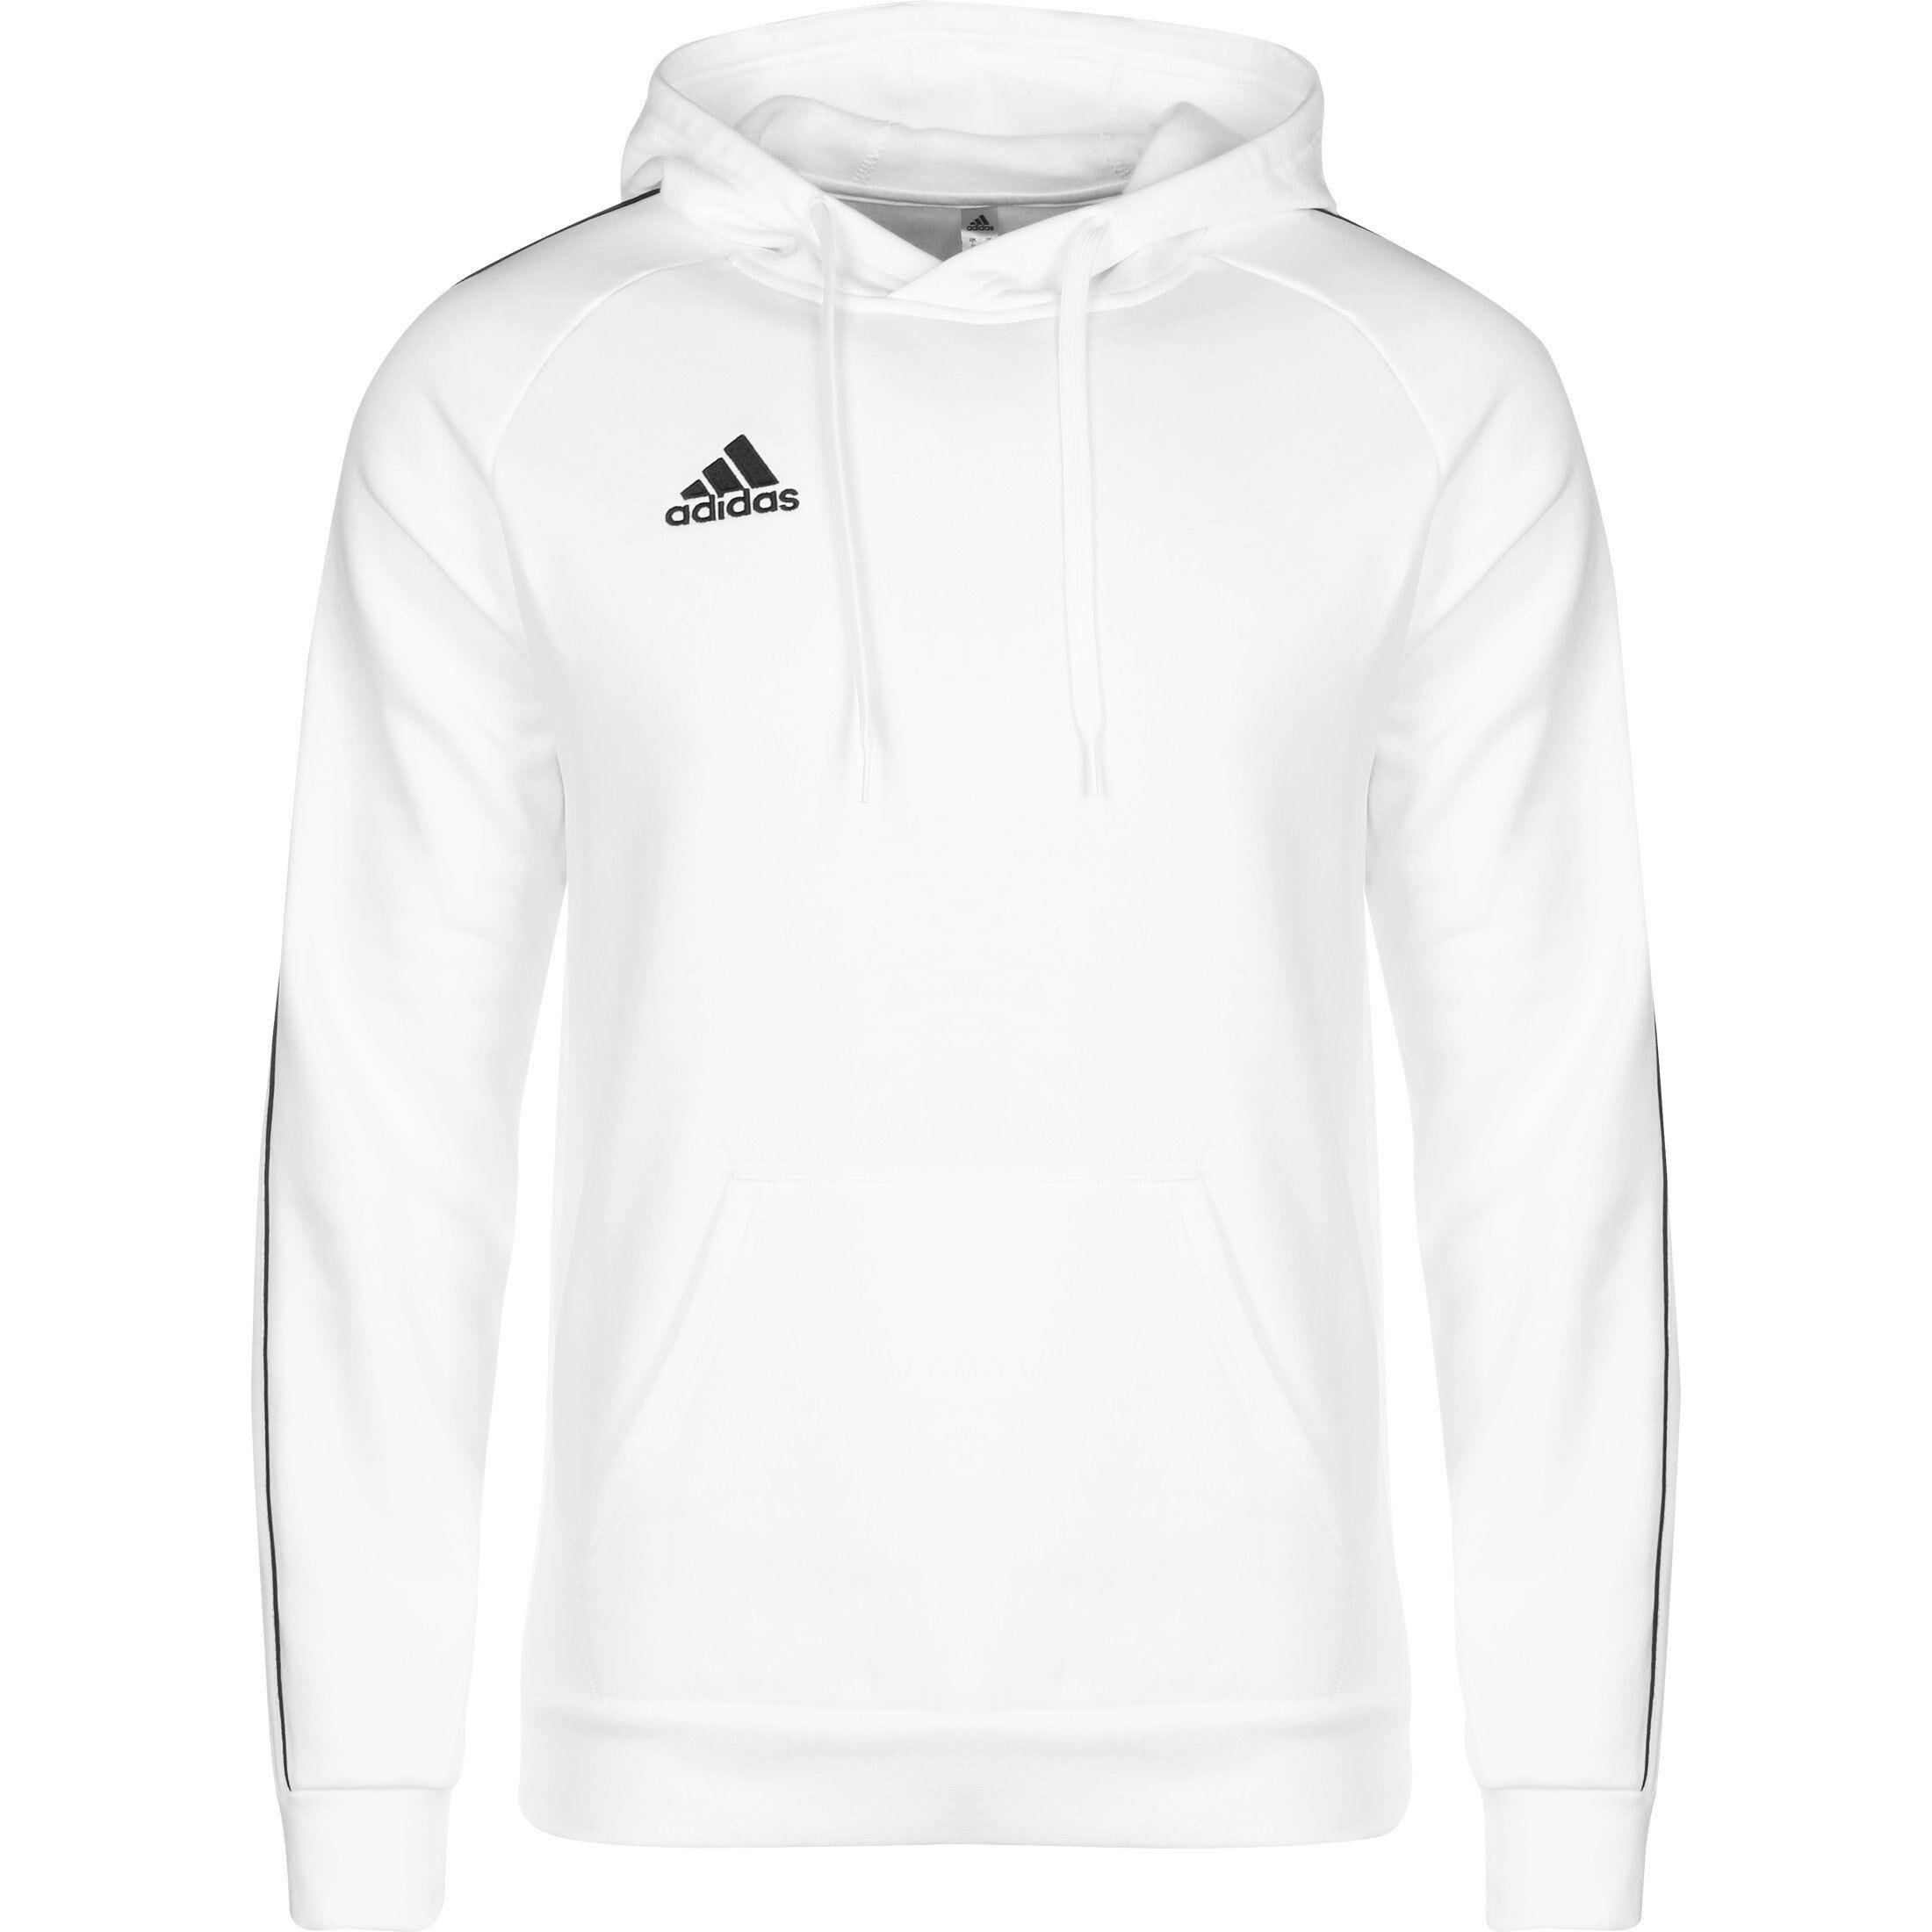 ADIDAS KINDER JUNGEN Gr.164 Kapuzensweatshirt Sweatshirt